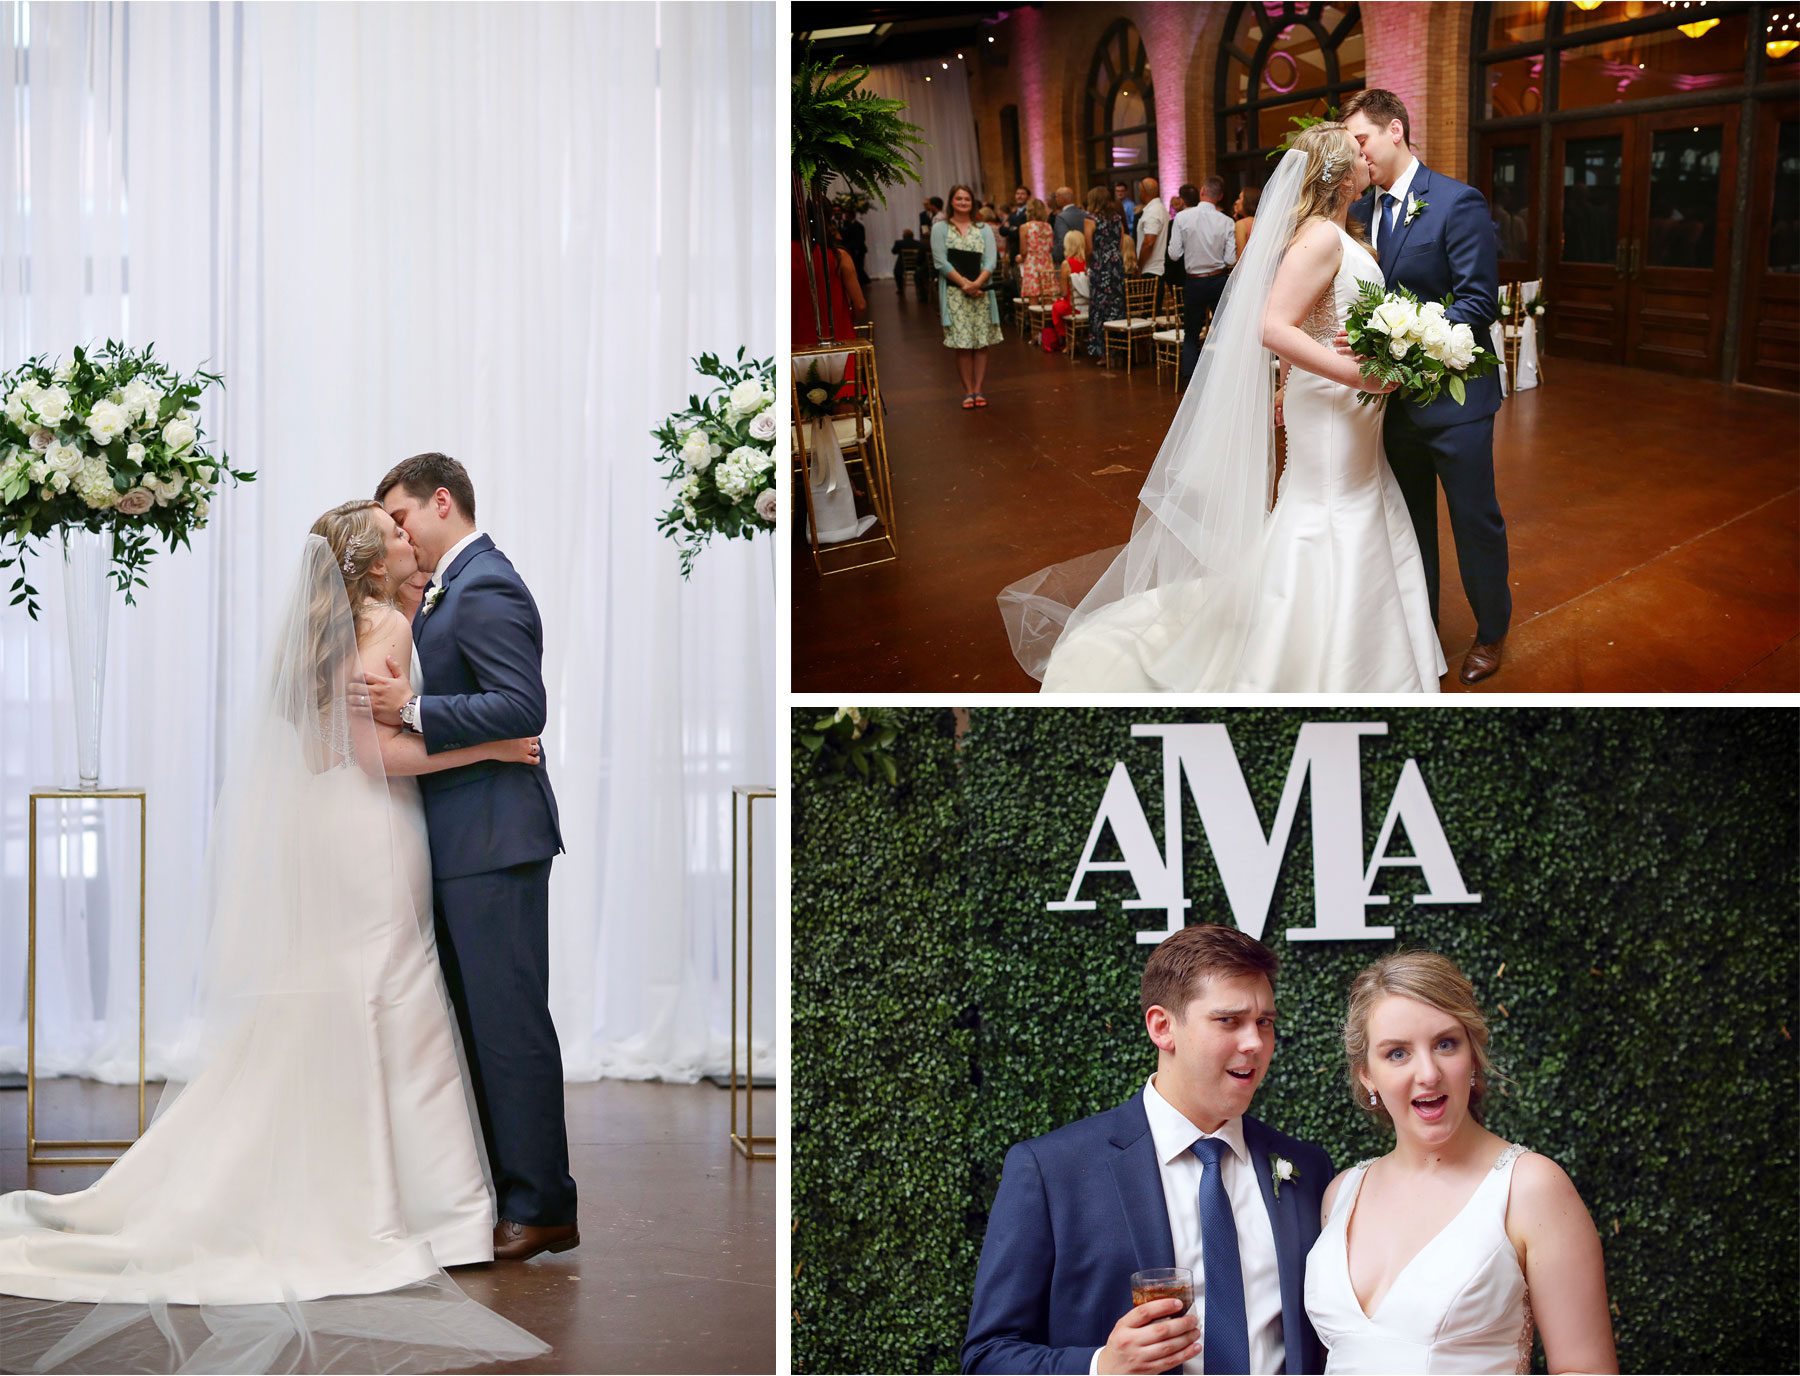 17-Minneapolis-Minnesota-Wedding-Vick-Photography-The-Depot-Ceremony-Amelia-and-Alexander.jpg